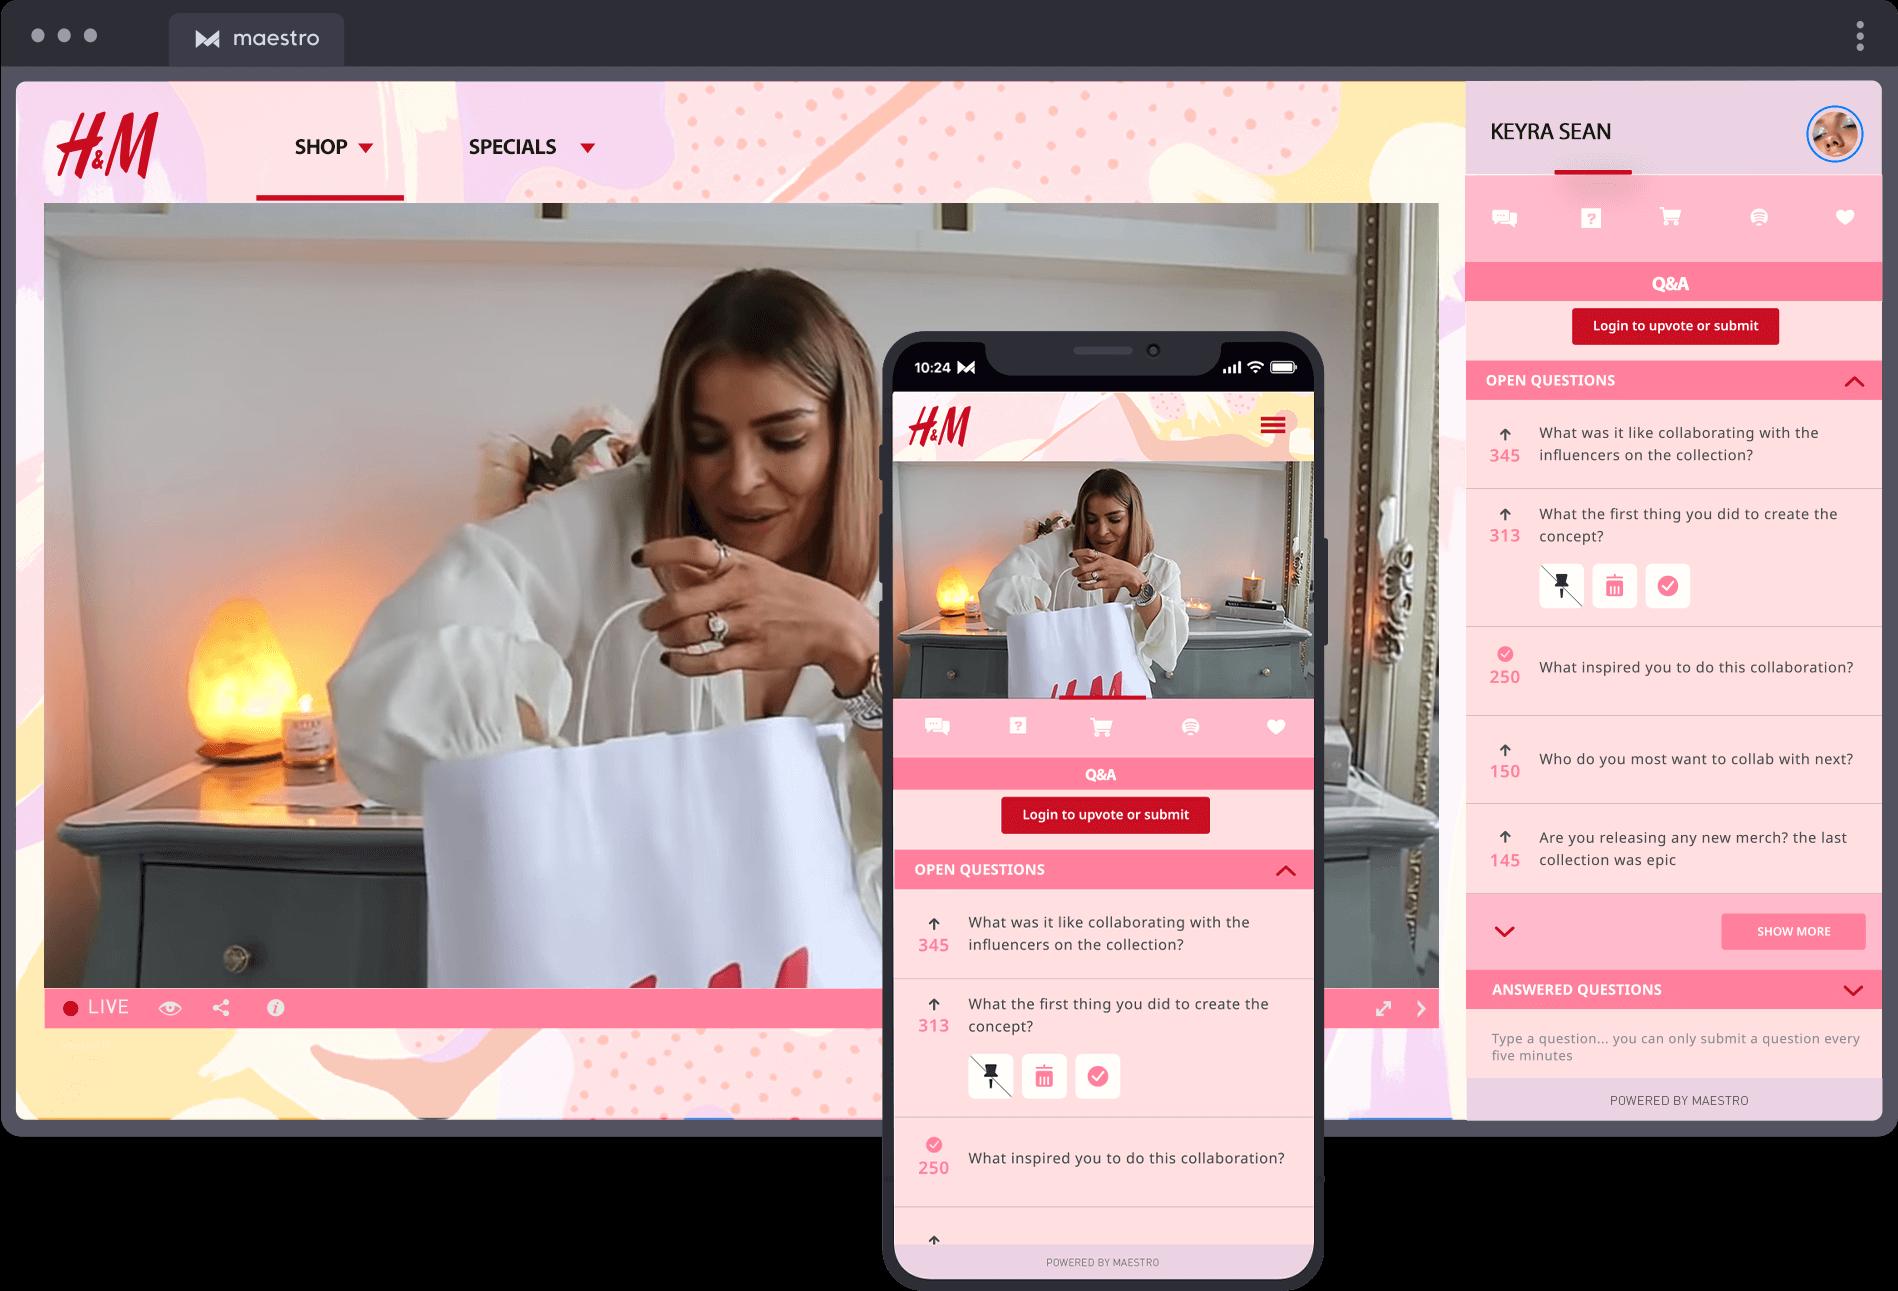 Retail & Fashion | Maestro Live Streaming